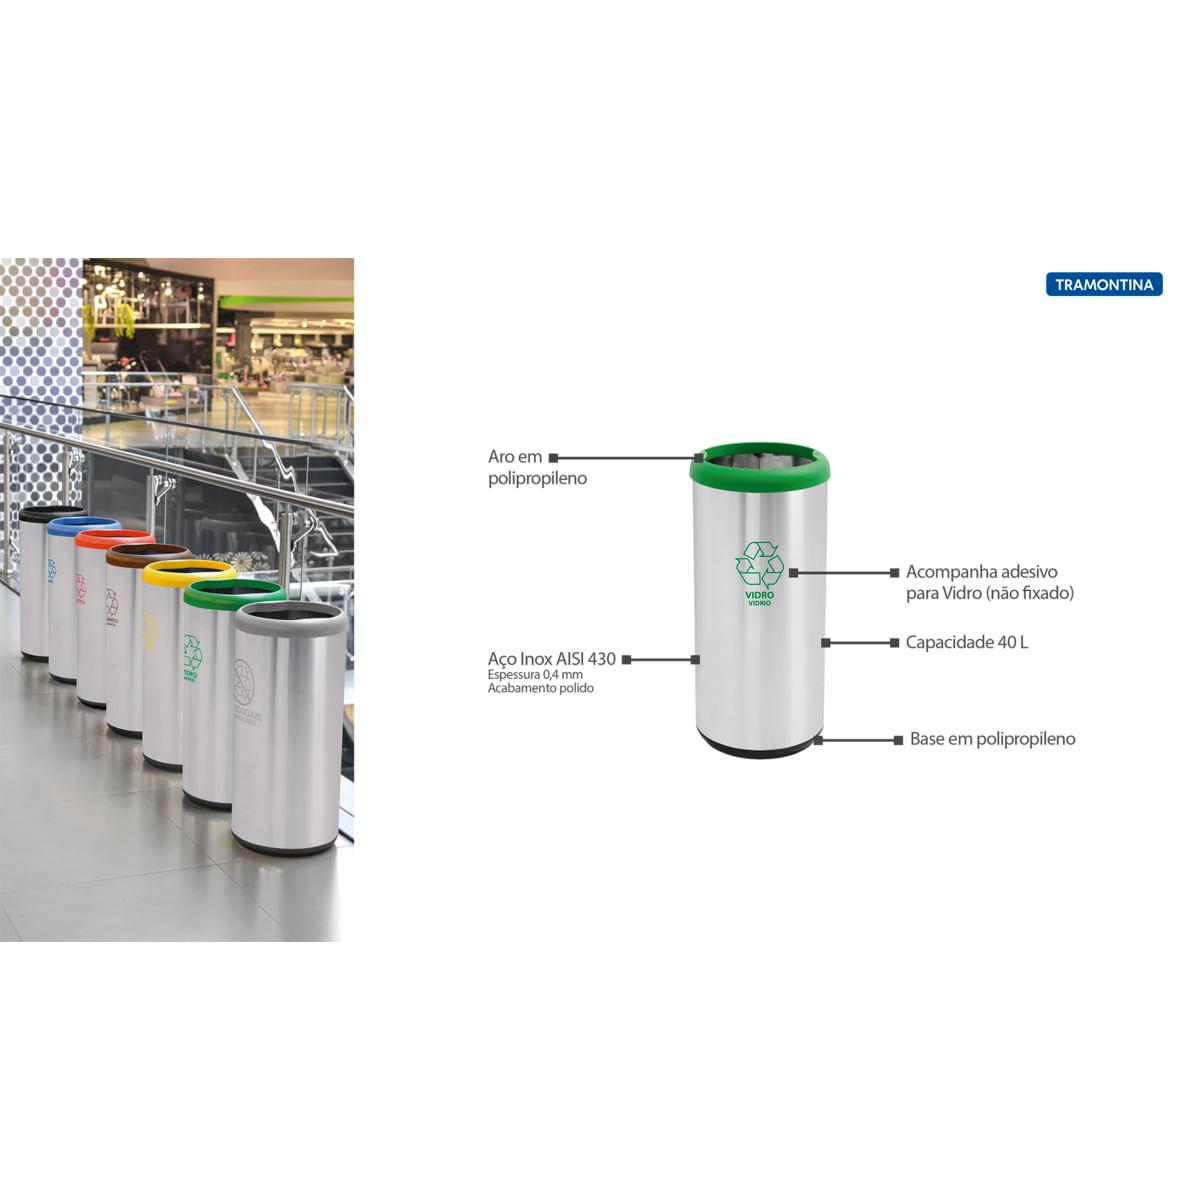 Lixeira Inox Tramontina 40 Litros Cápsula Selecta Plus Verde